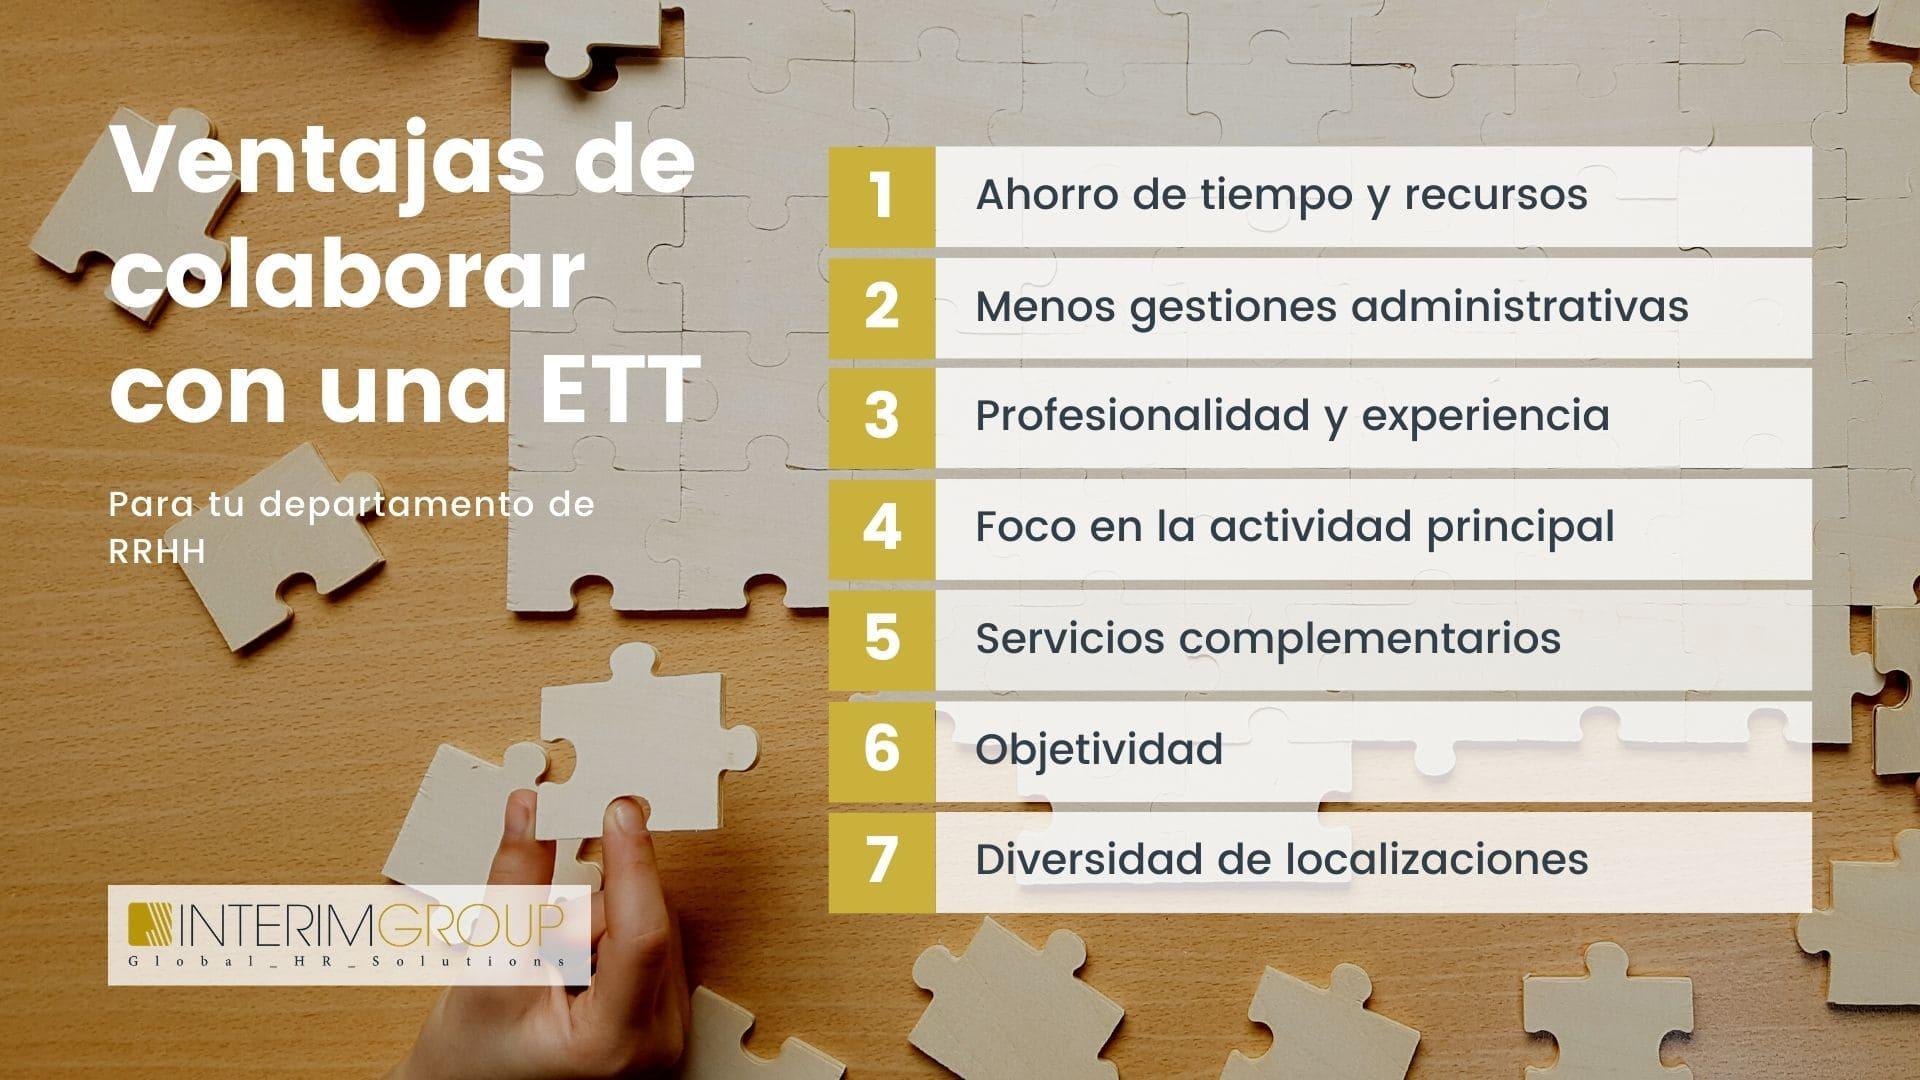 Ventajas de contratar ETT_INTERIM-GROUP